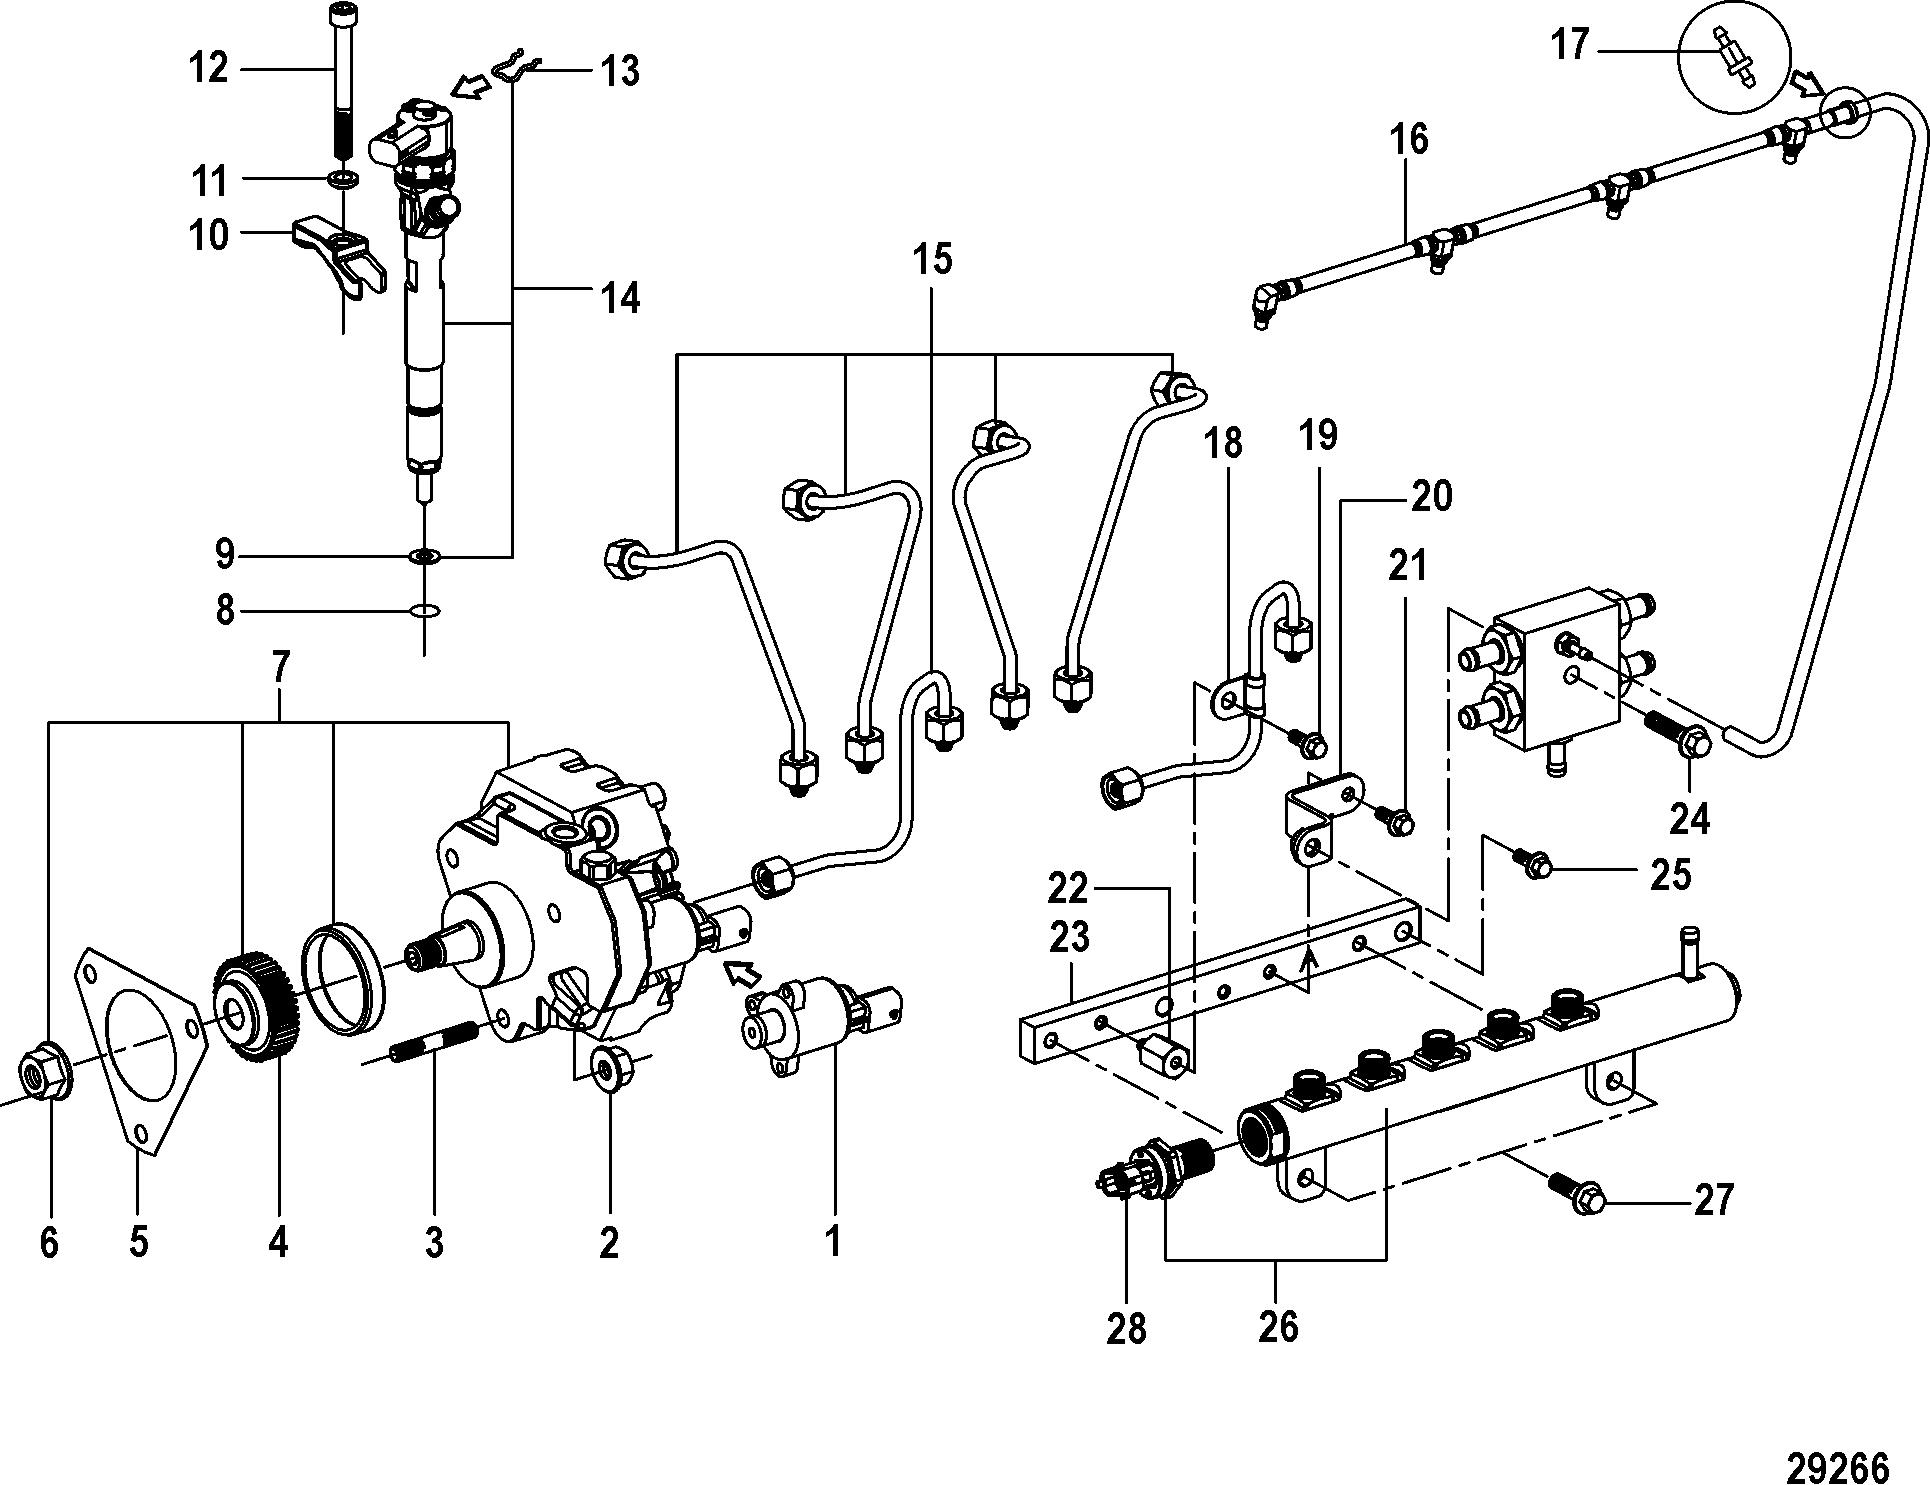 Mercury Mercruiser Cmd Qsd 28 Ei 220 88300000 Up Fuel Pump Diagram System